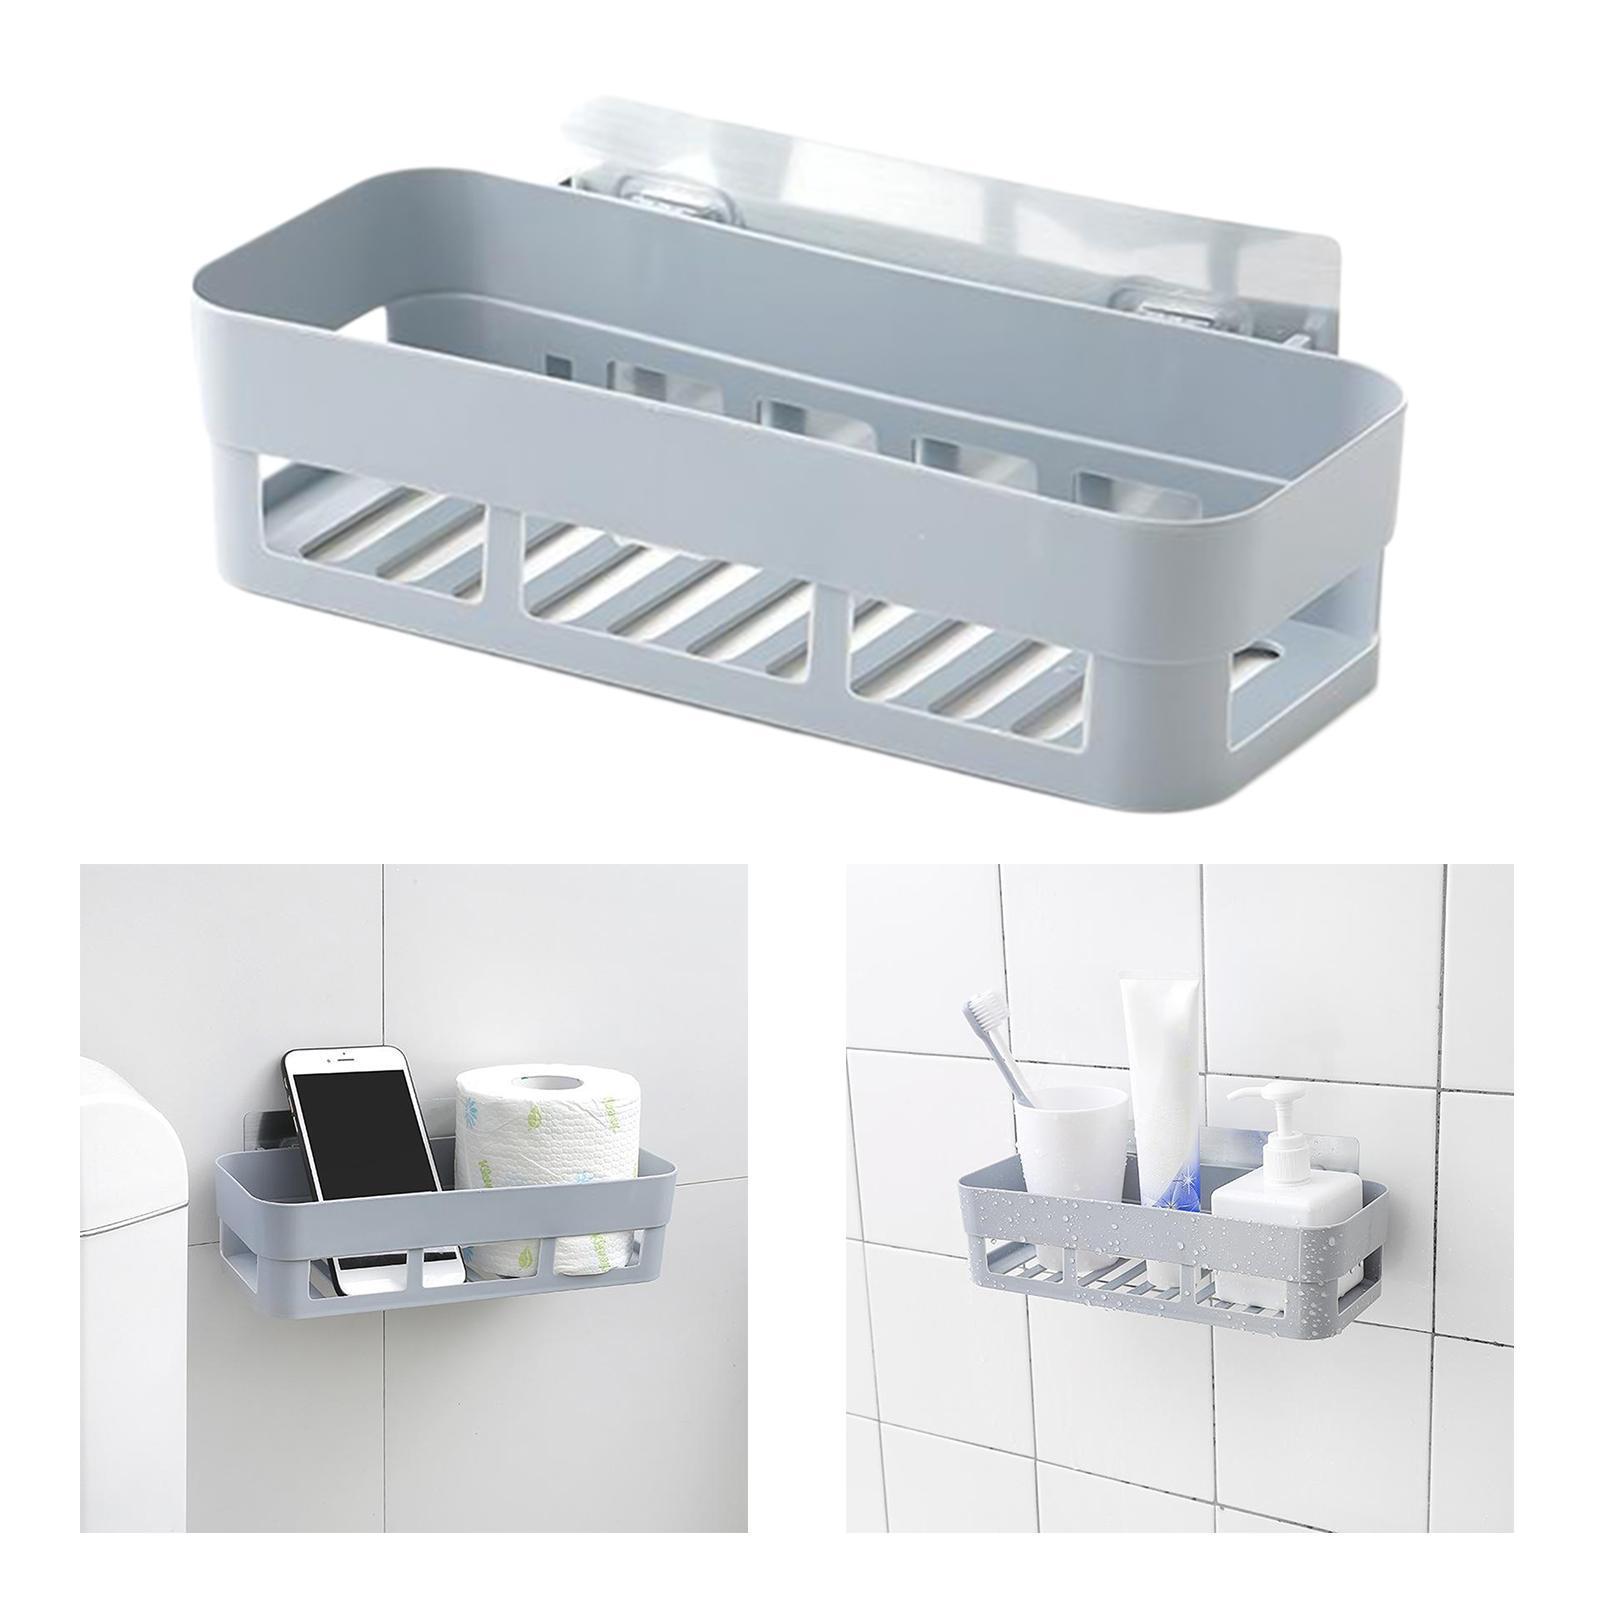 thumbnail 33 - Wall-Suction-Bathroom-Shelf-Shower-Caddy-Wall-Mount-Storage-Rack-Organizer